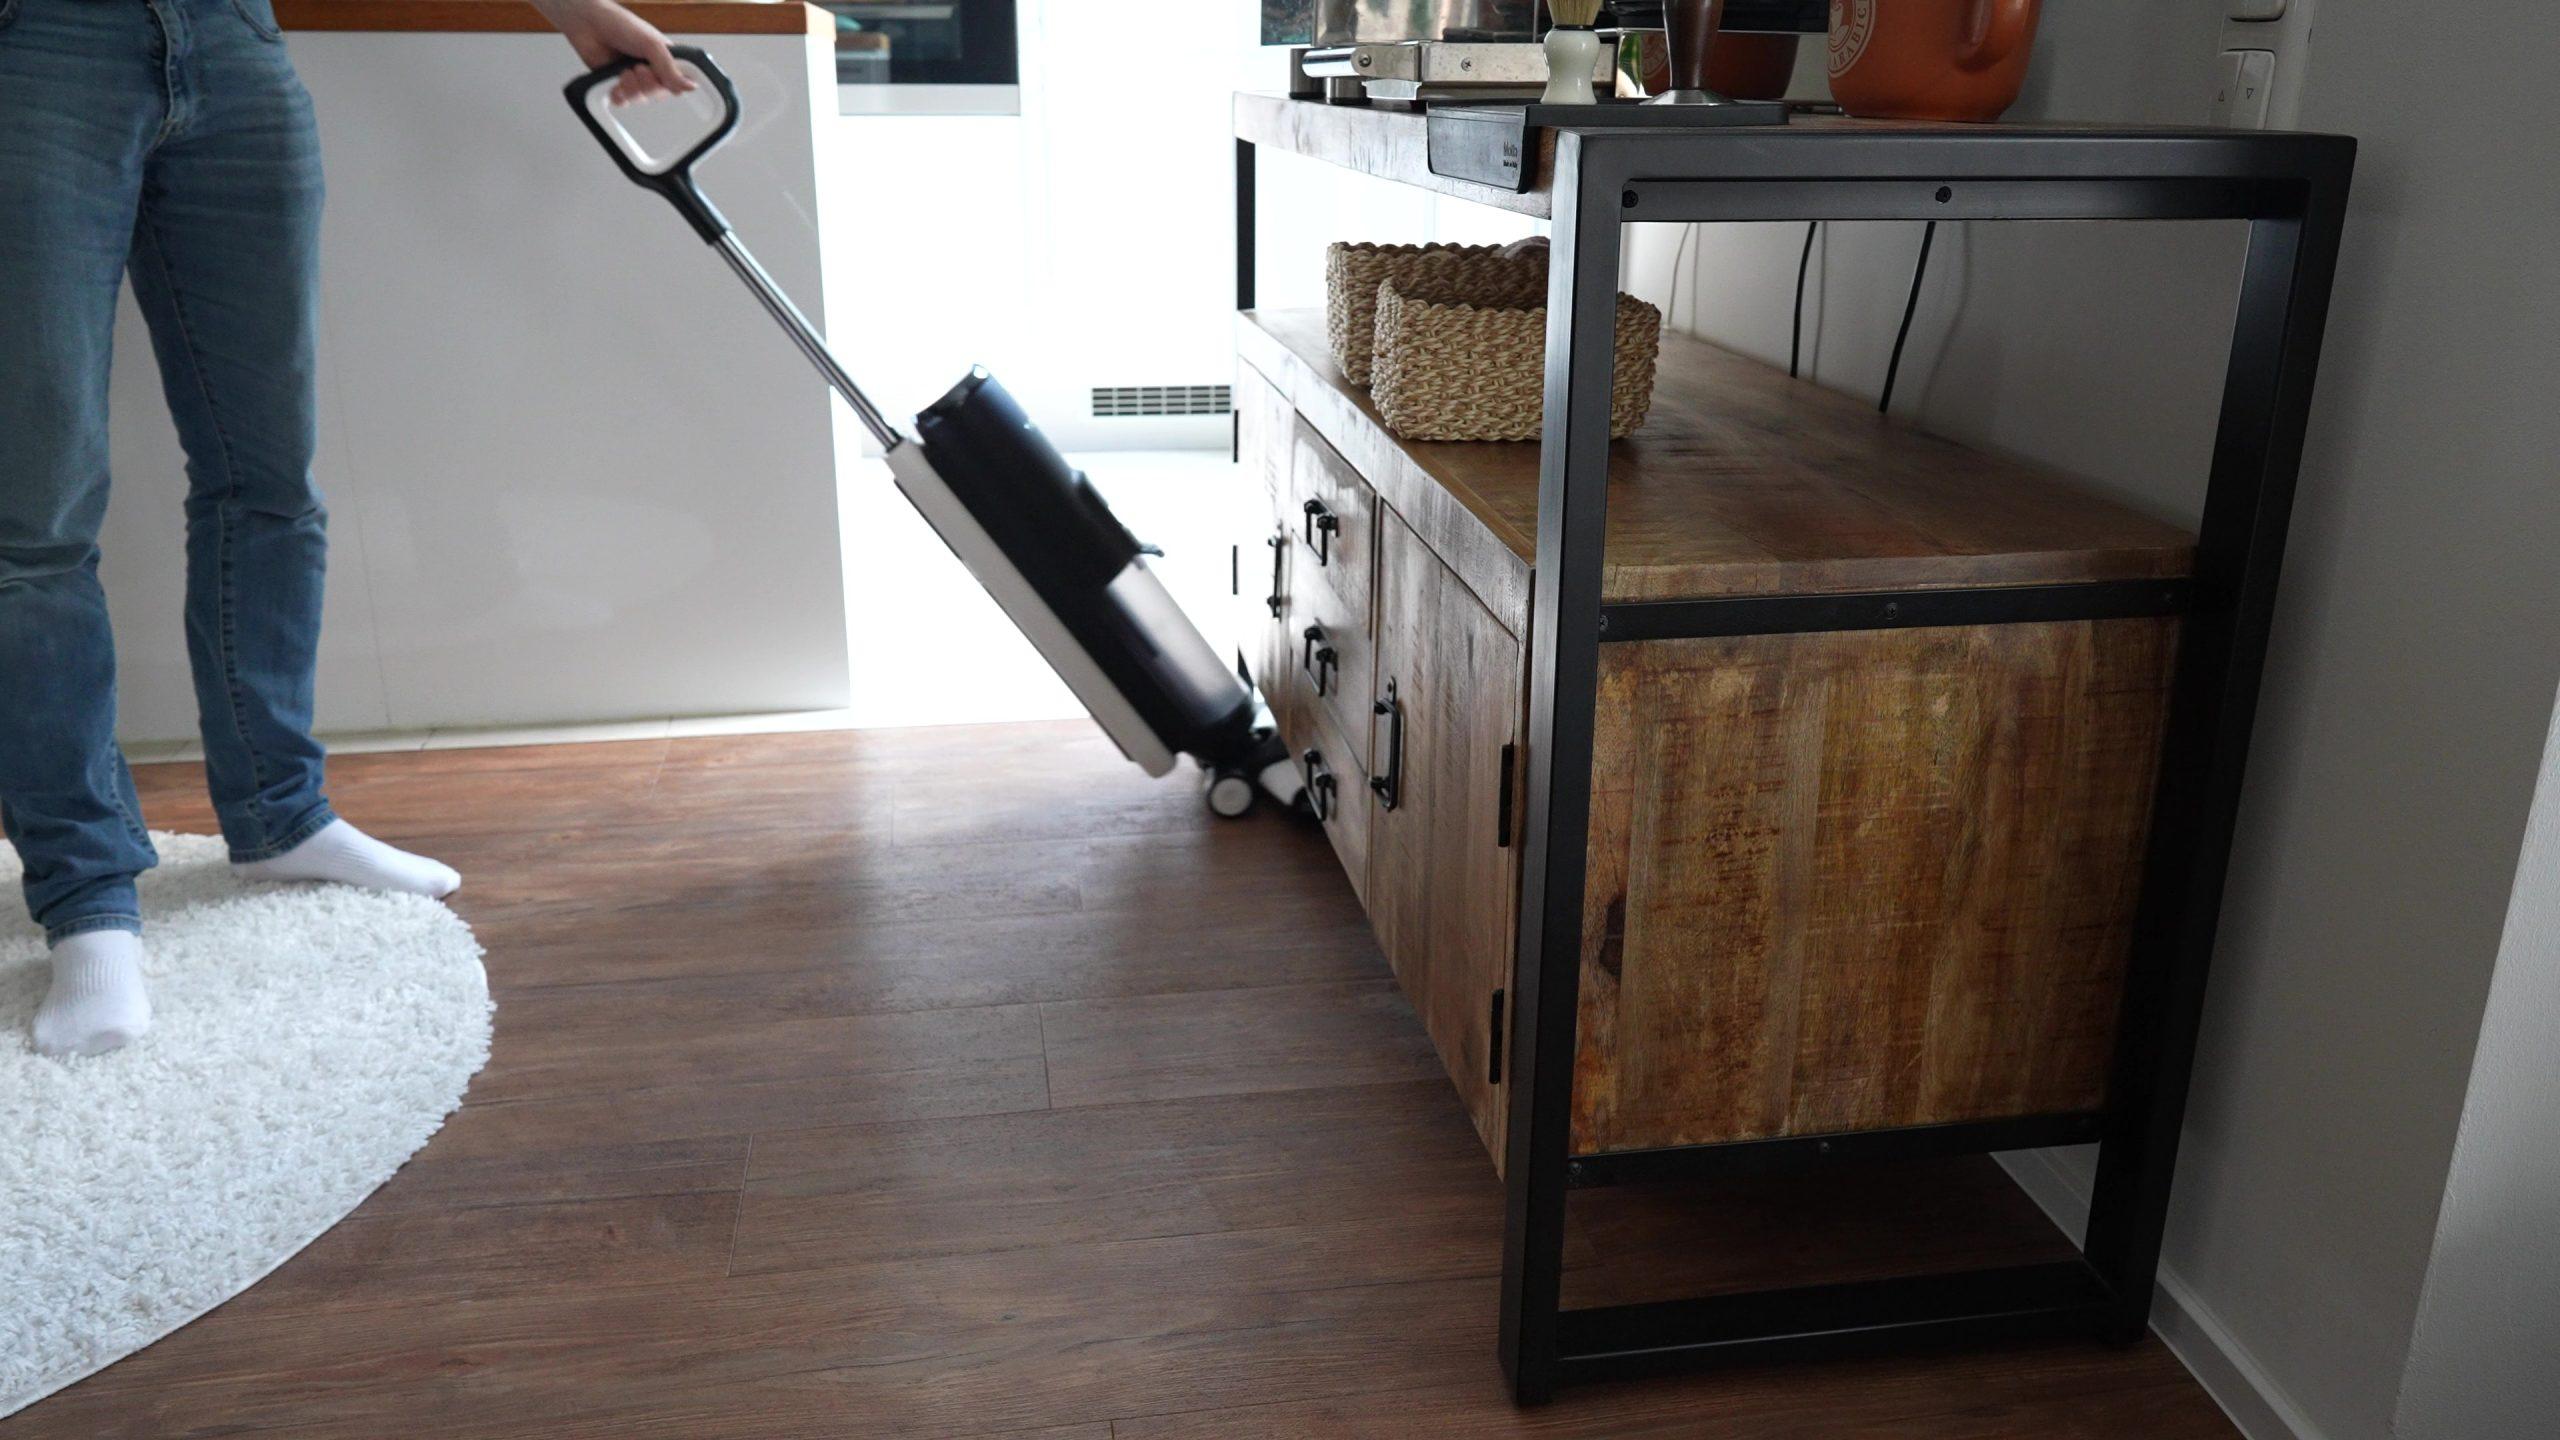 Tineco Floor One S5 Pro Wischsauger Akkusauger Reinigungswinkel Schwachstelle